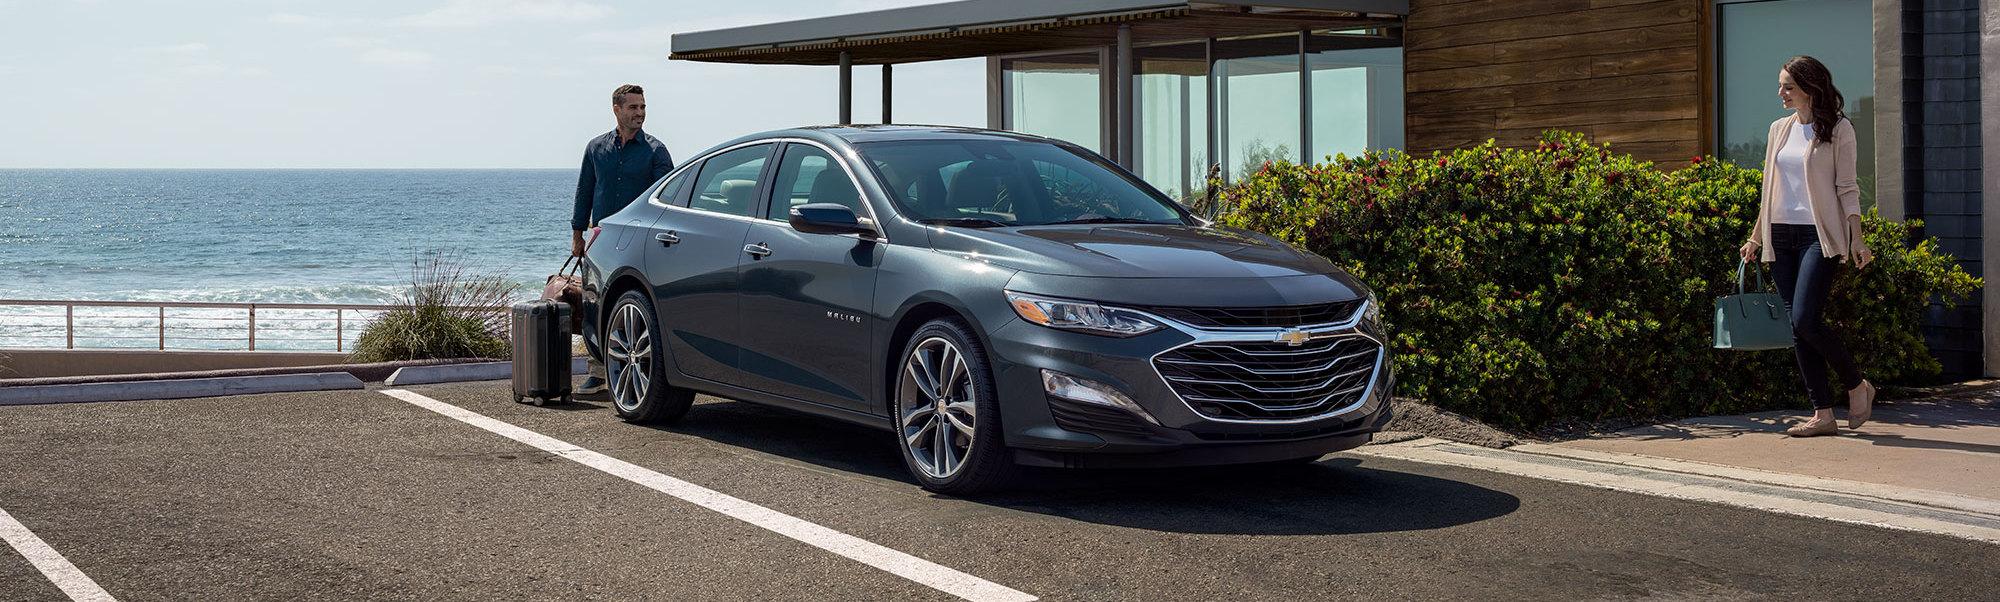 Prepare Your Chevrolet for Summer Travel near Tulsa, OK